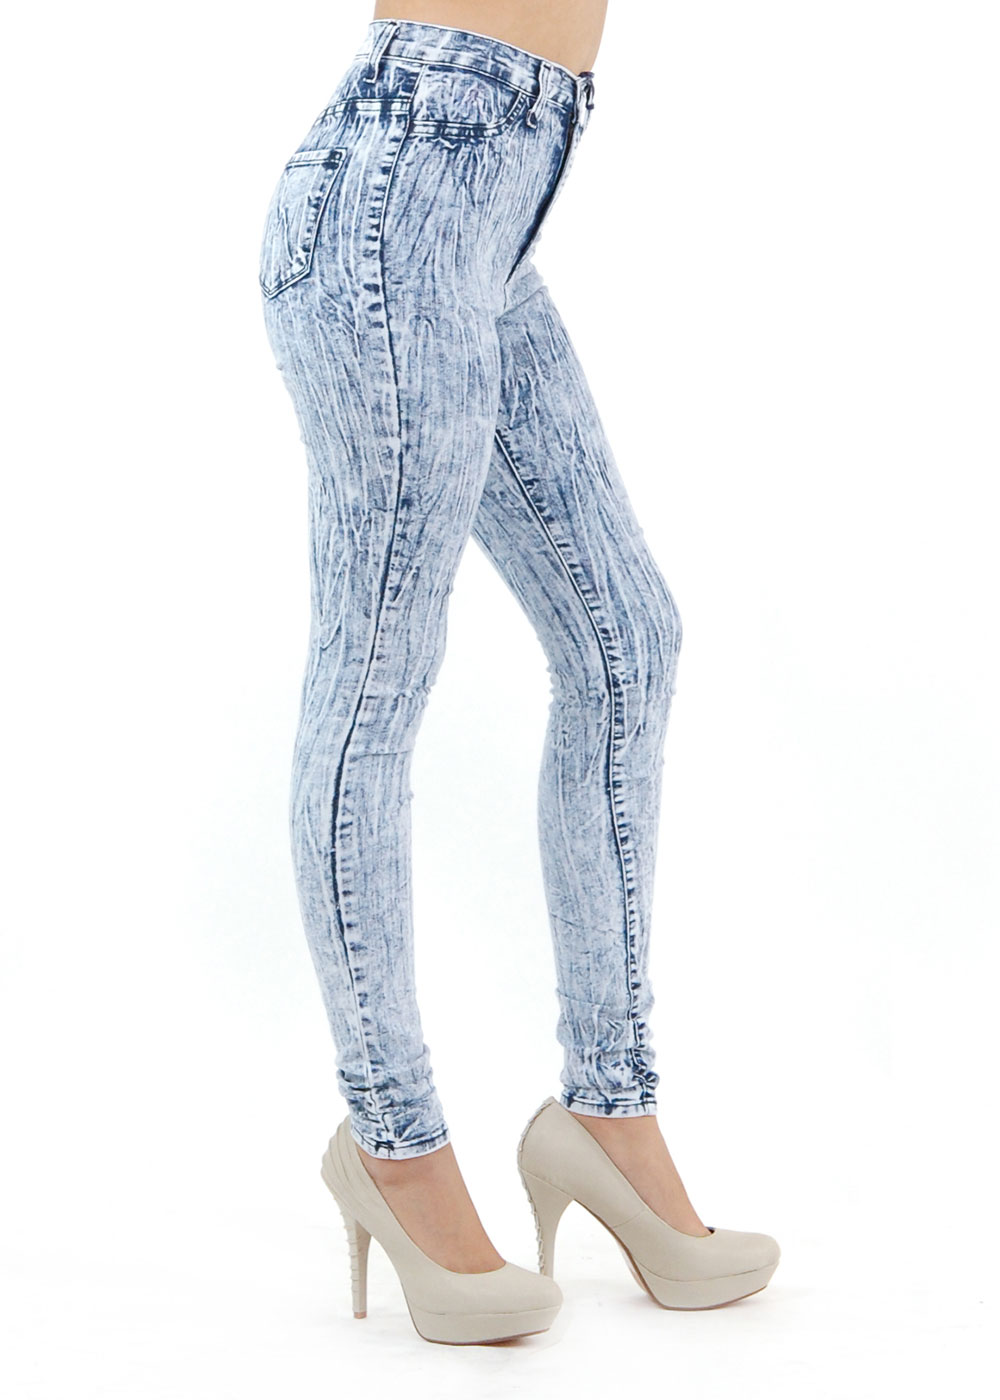 High Waisted Jeans - Skinny Jeans - Acid Wash Jeans - $36.99